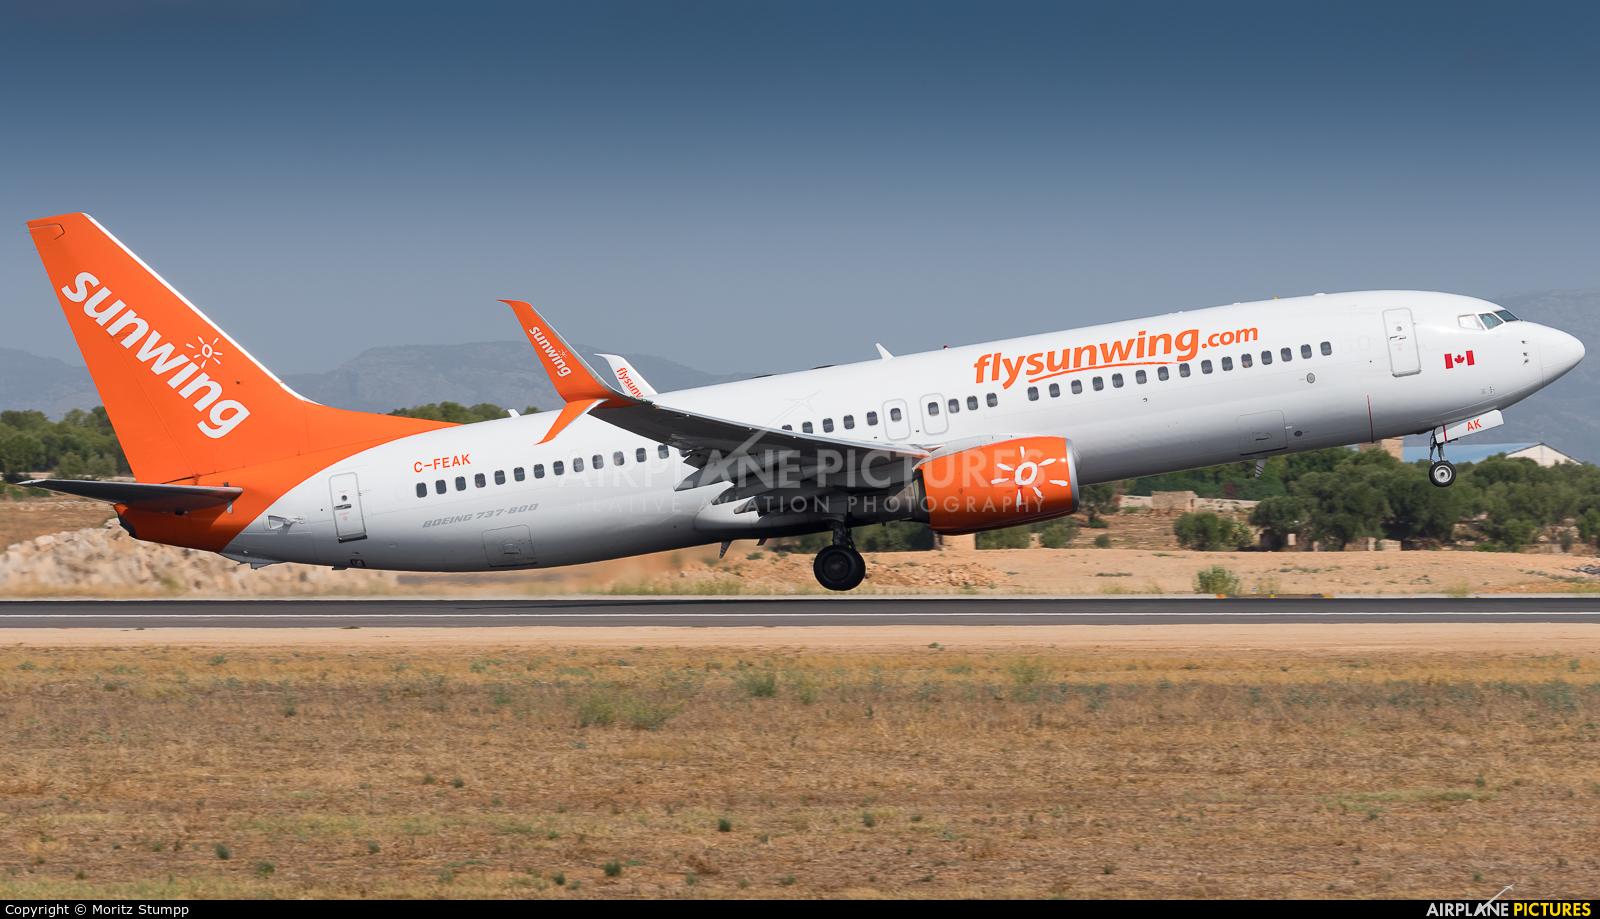 Sunwing Airlines C-FEAK aircraft at Palma de Mallorca